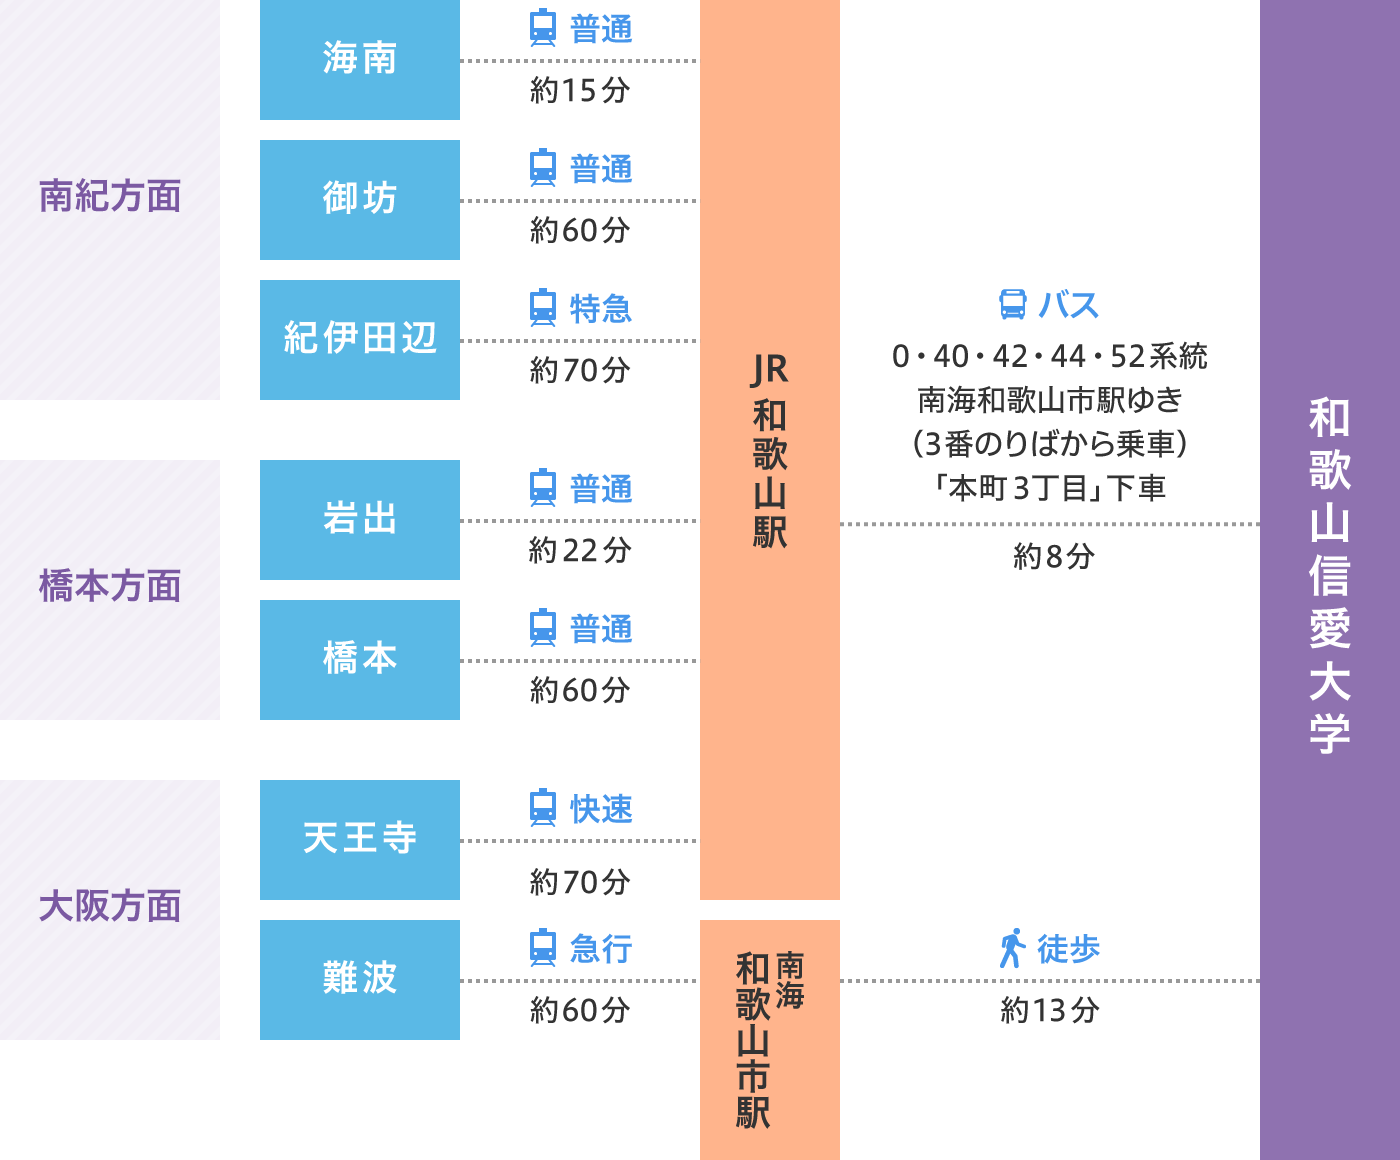 和歌山信愛大学の路線図